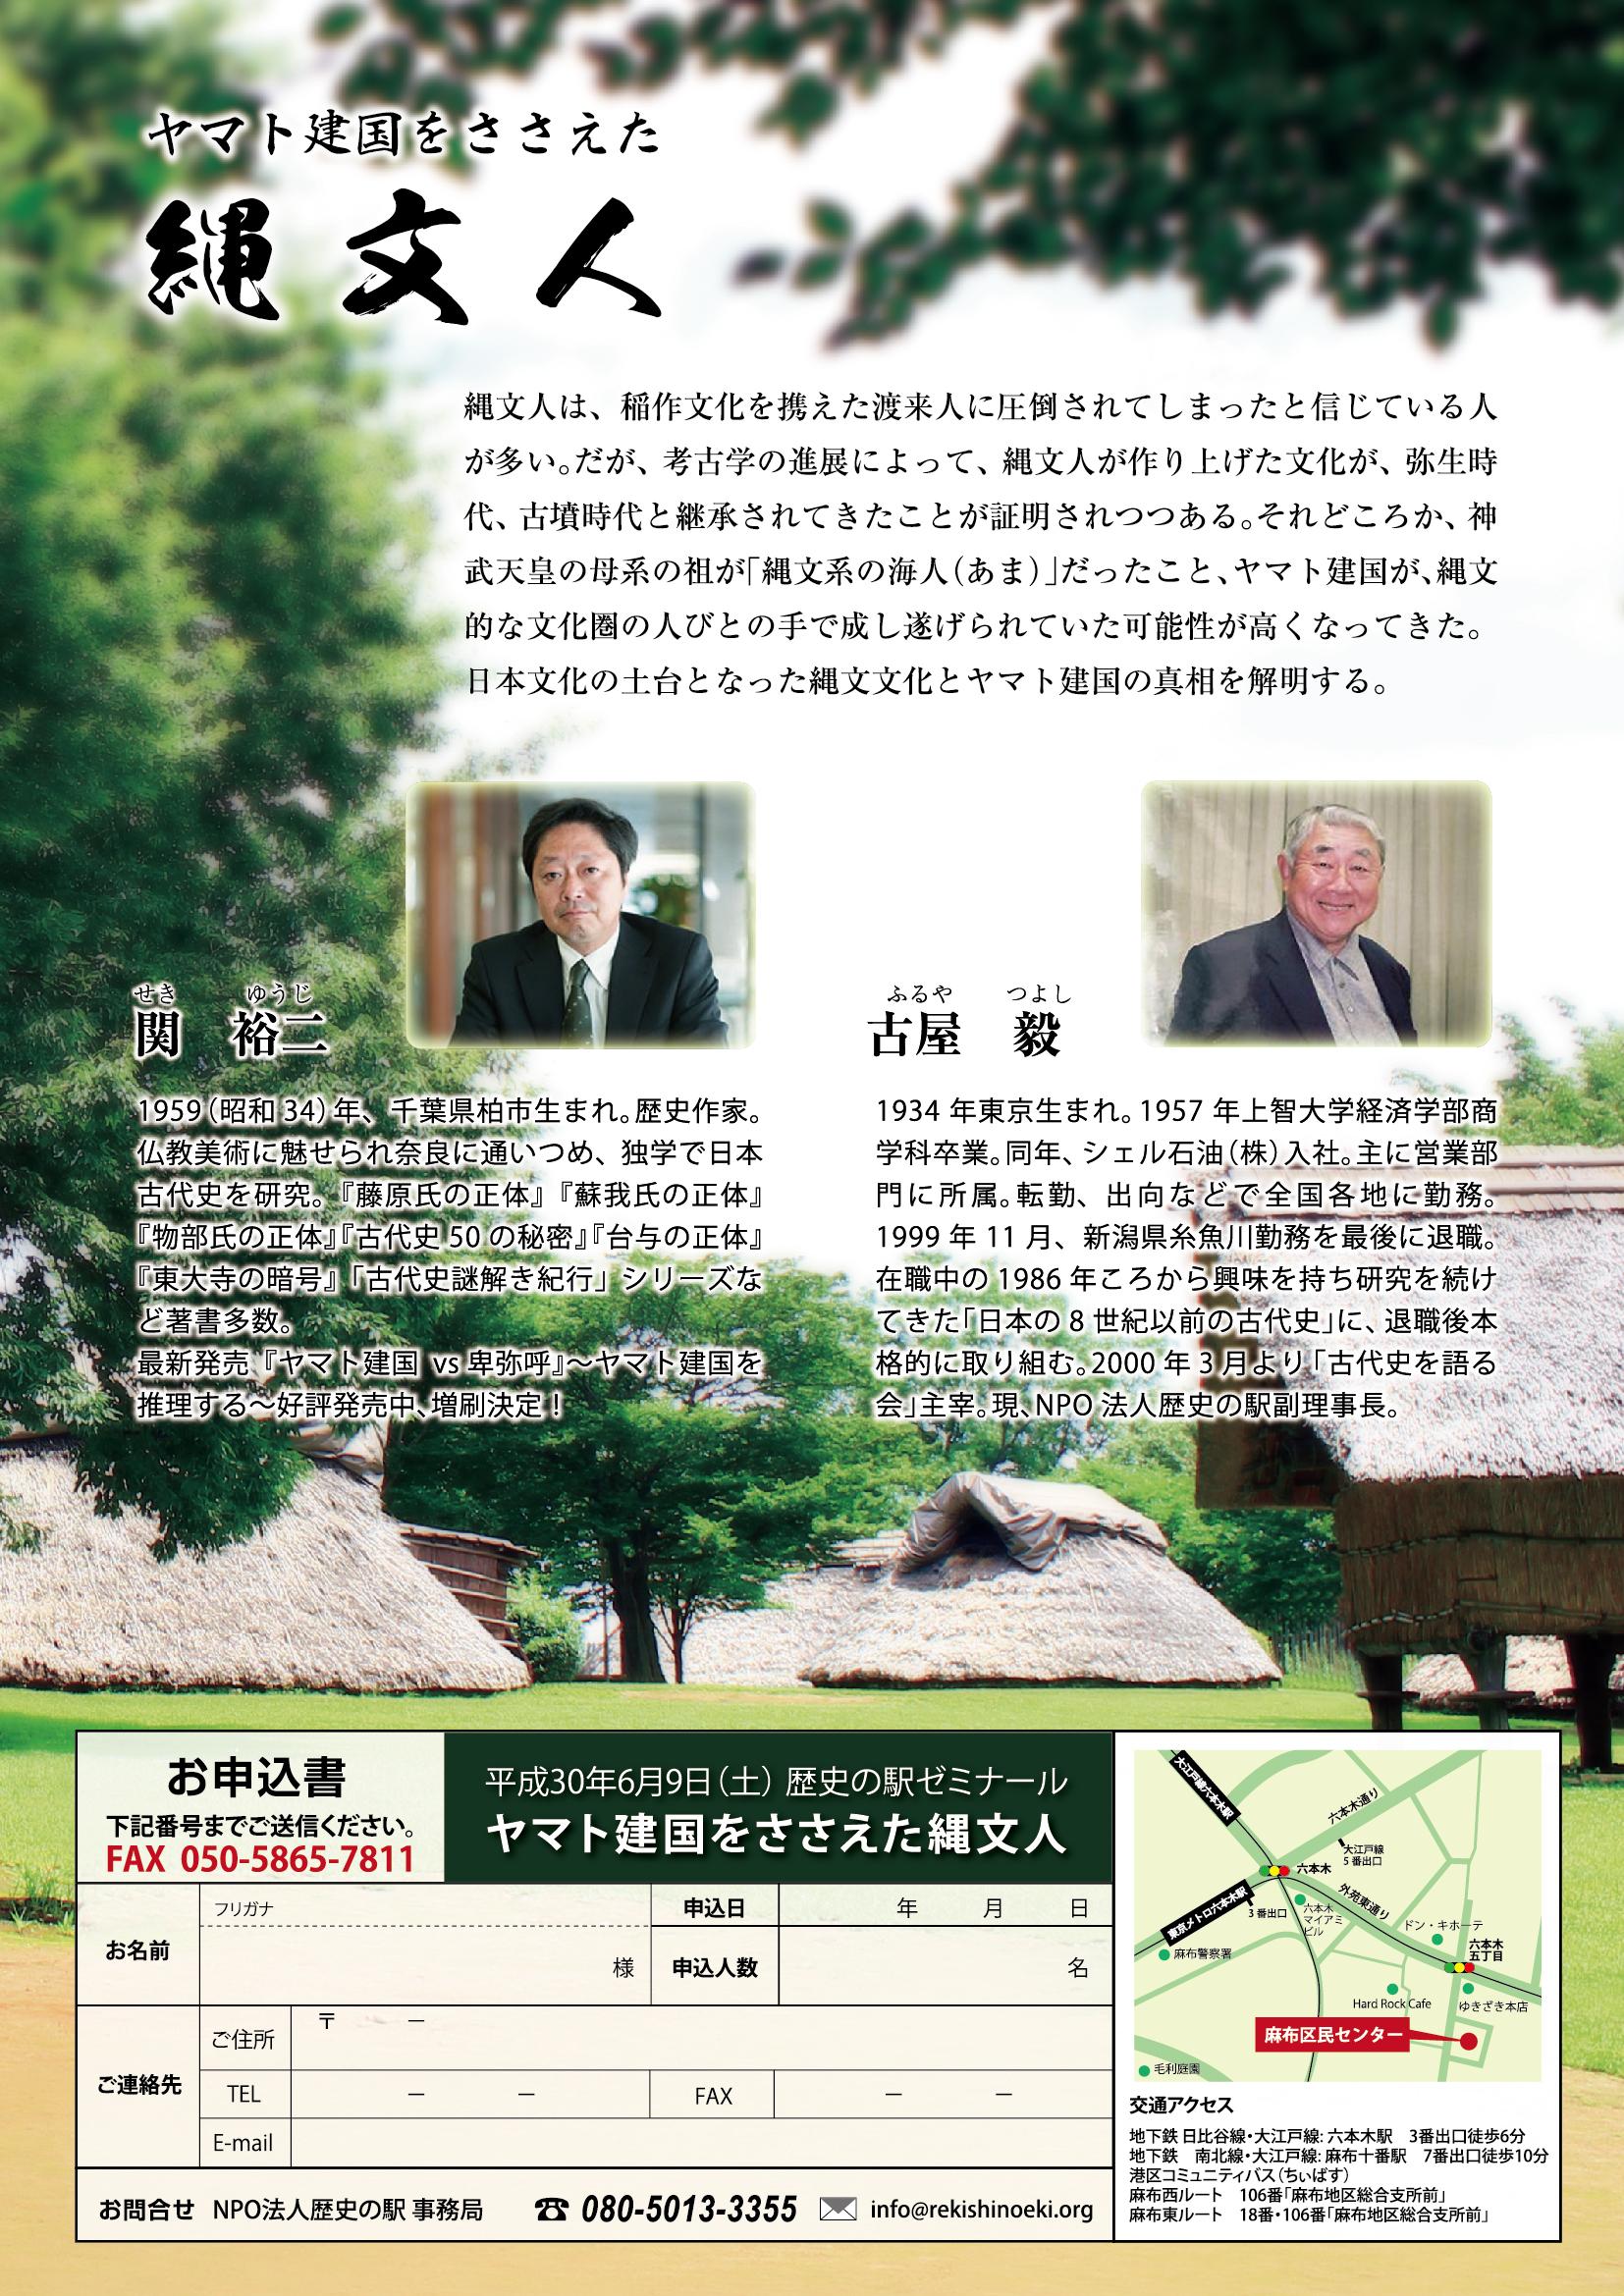 NPO法人歴史の駅ゼミナール ヤマト建国をささえた縄文人